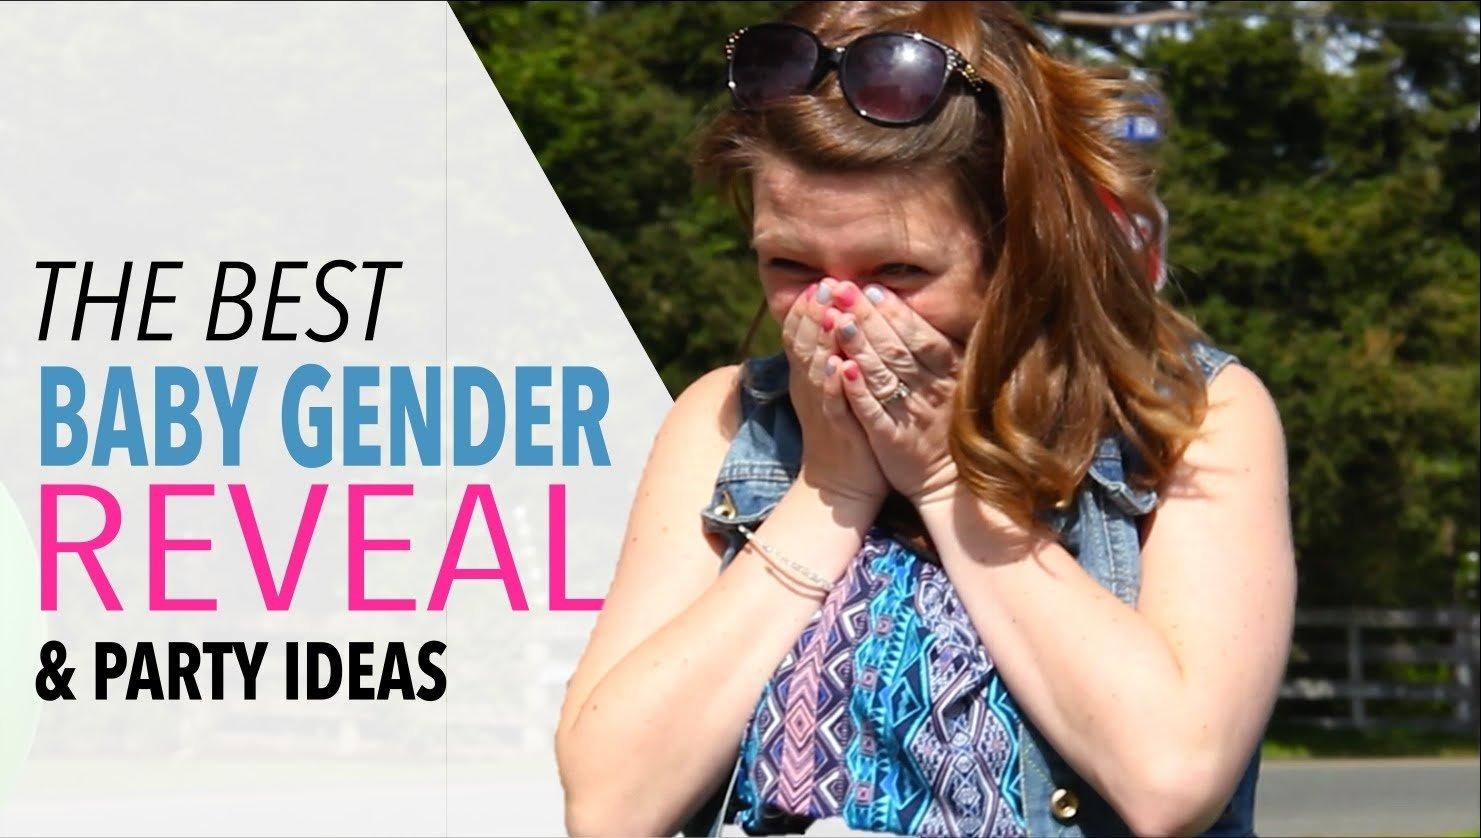 10 Trendy Unique Baby Gender Reveal Ideas baby gender reveal party fun gender reveal party ideas youtube 1 2020